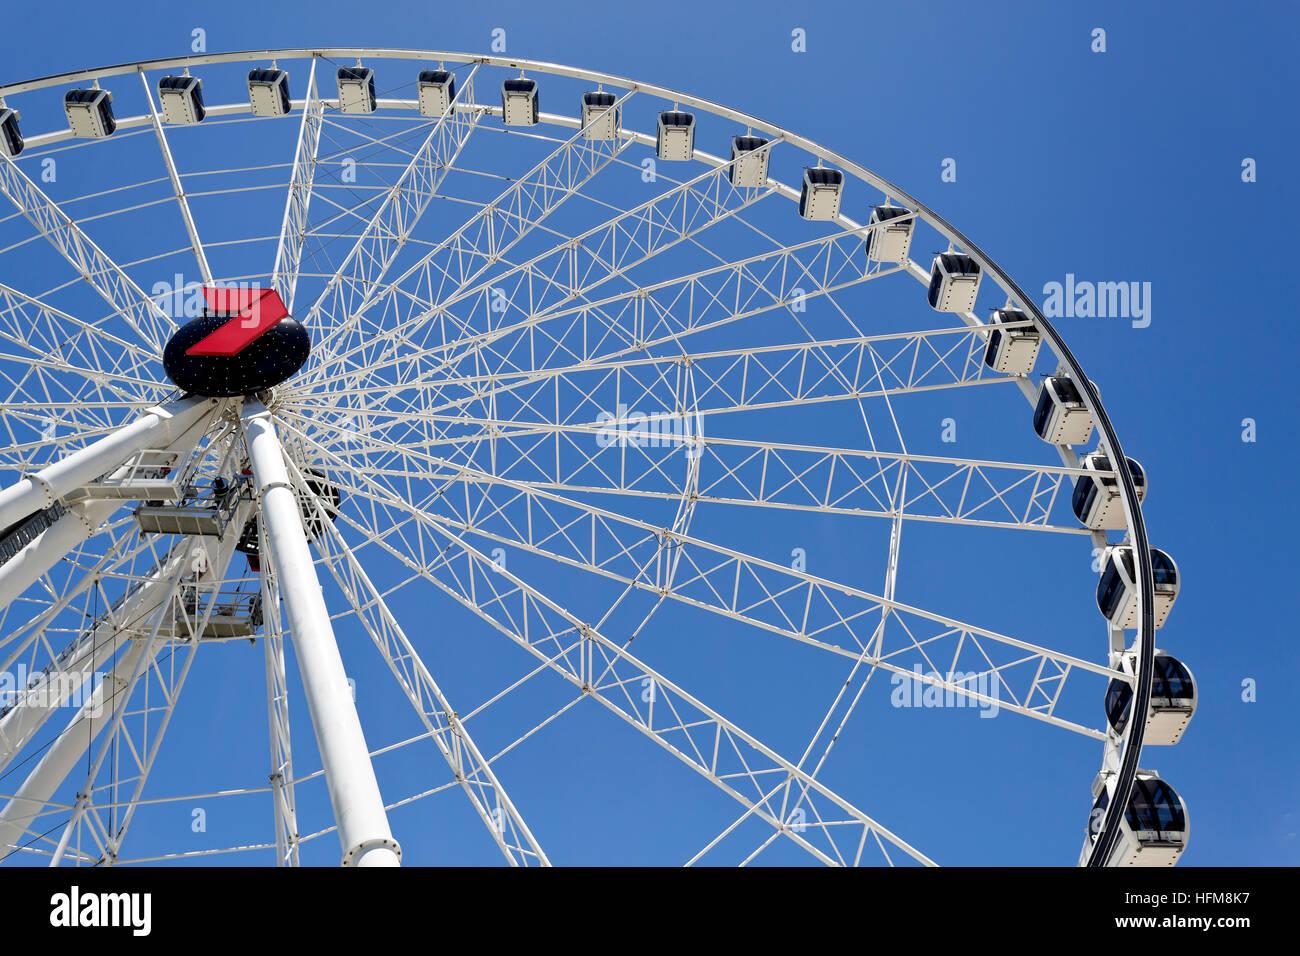 La rueda de Brisbane es casi una noria de 60 metros de altura instalada en Brisbane, Australia. Foto de stock